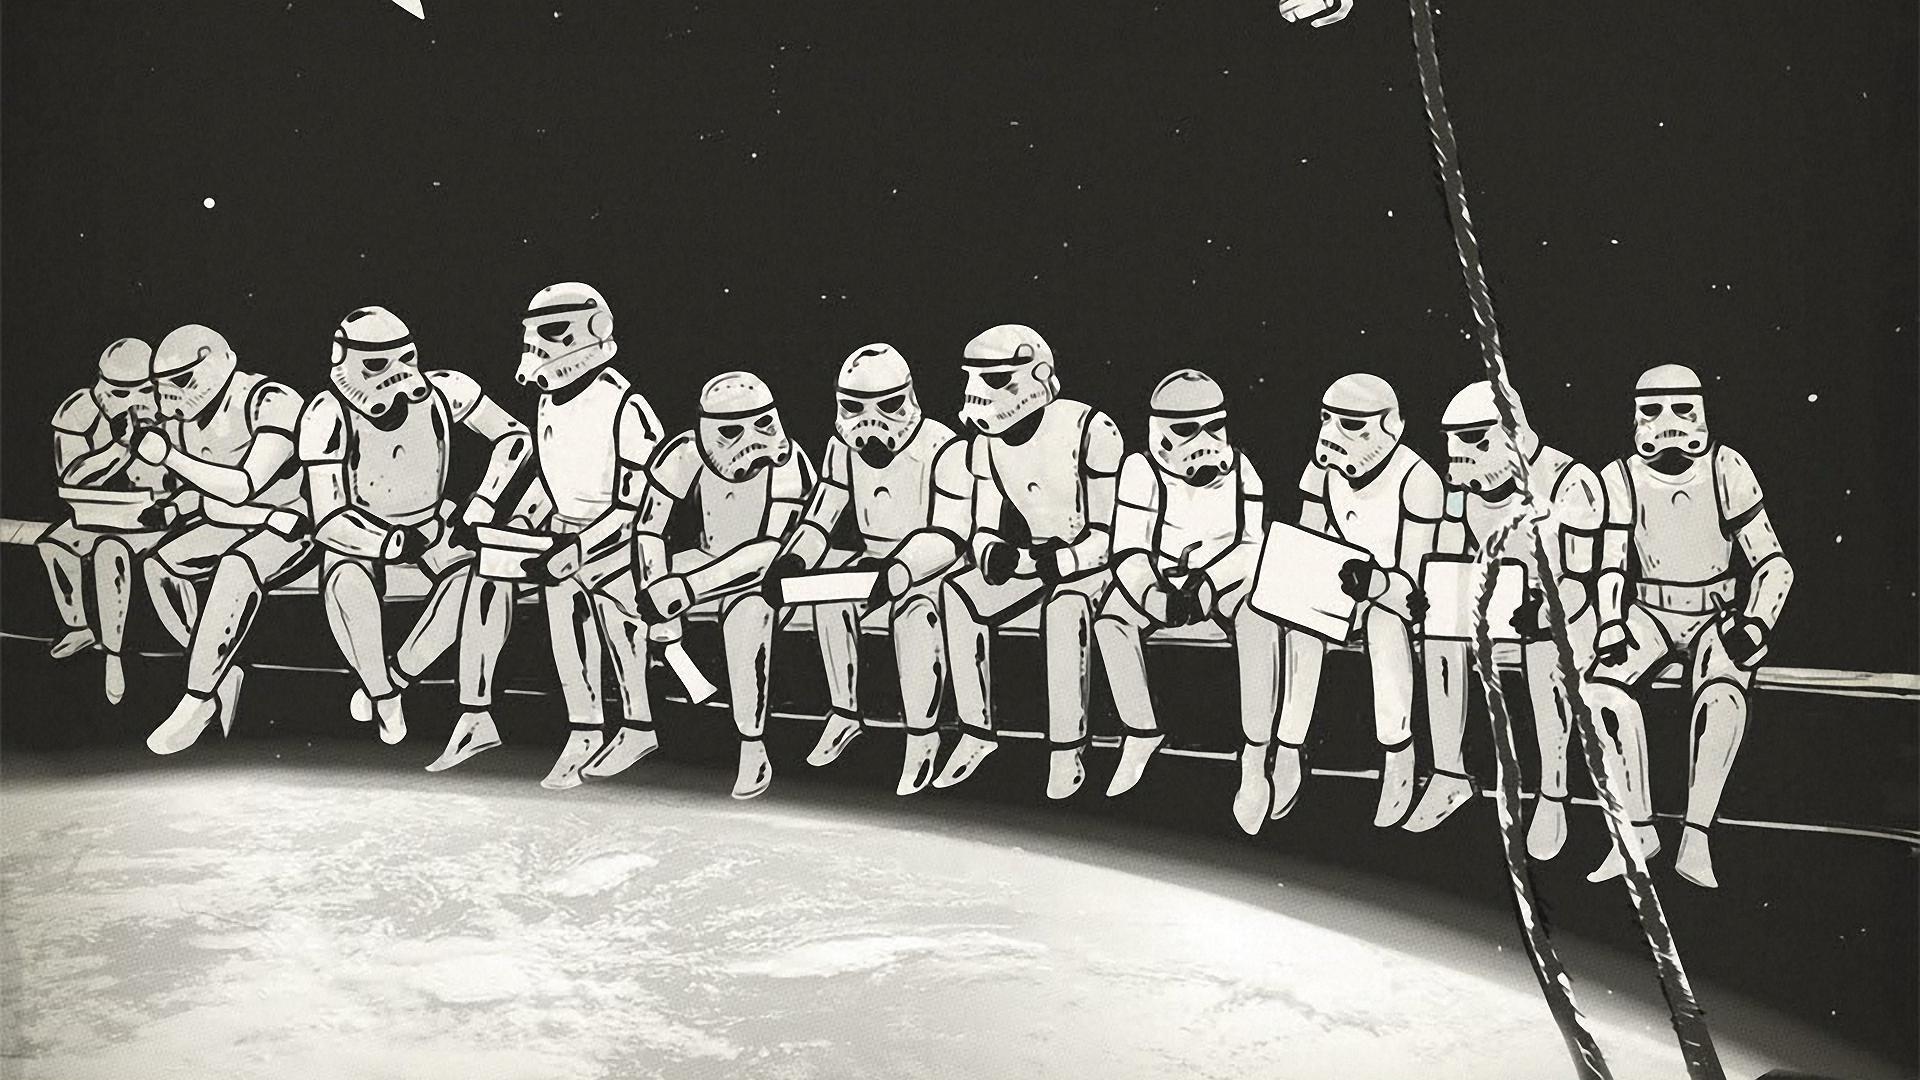 Star Wars Hd Wallpaper Background Image 1920x1080 Id246479